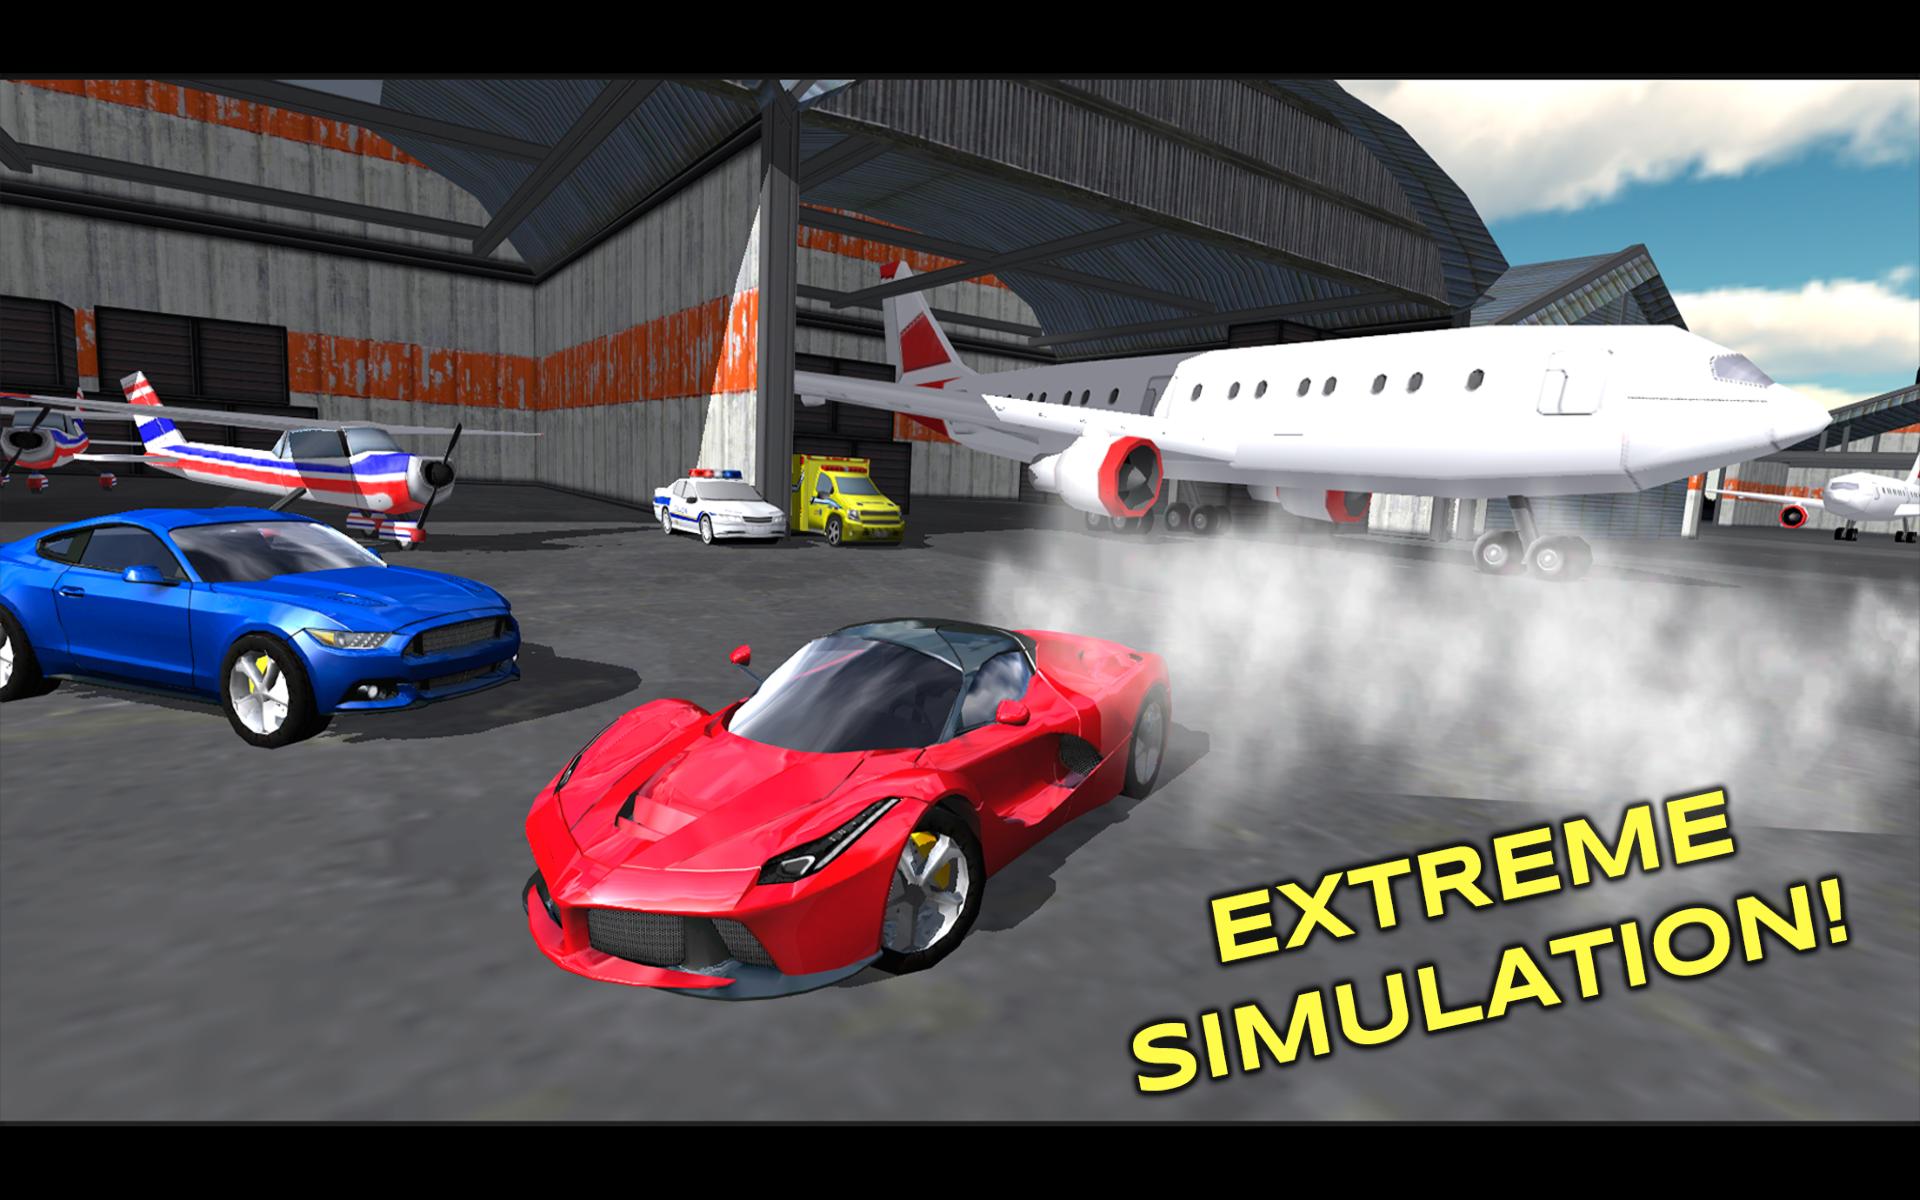 Roblox Vehicle Simulator Best Car 2018 - Extreme Car Driving Simulator 3d